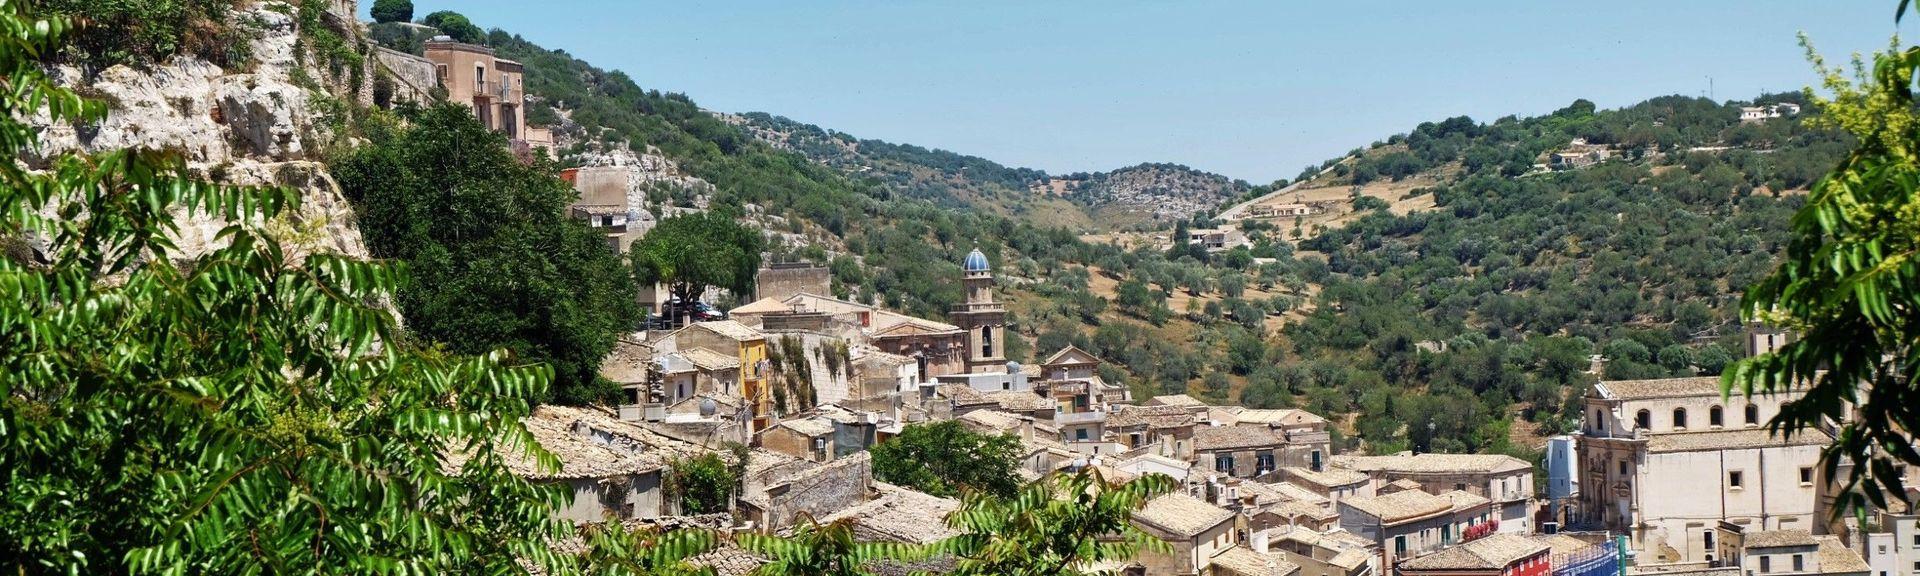 Ragusa, Sicilien, Italien